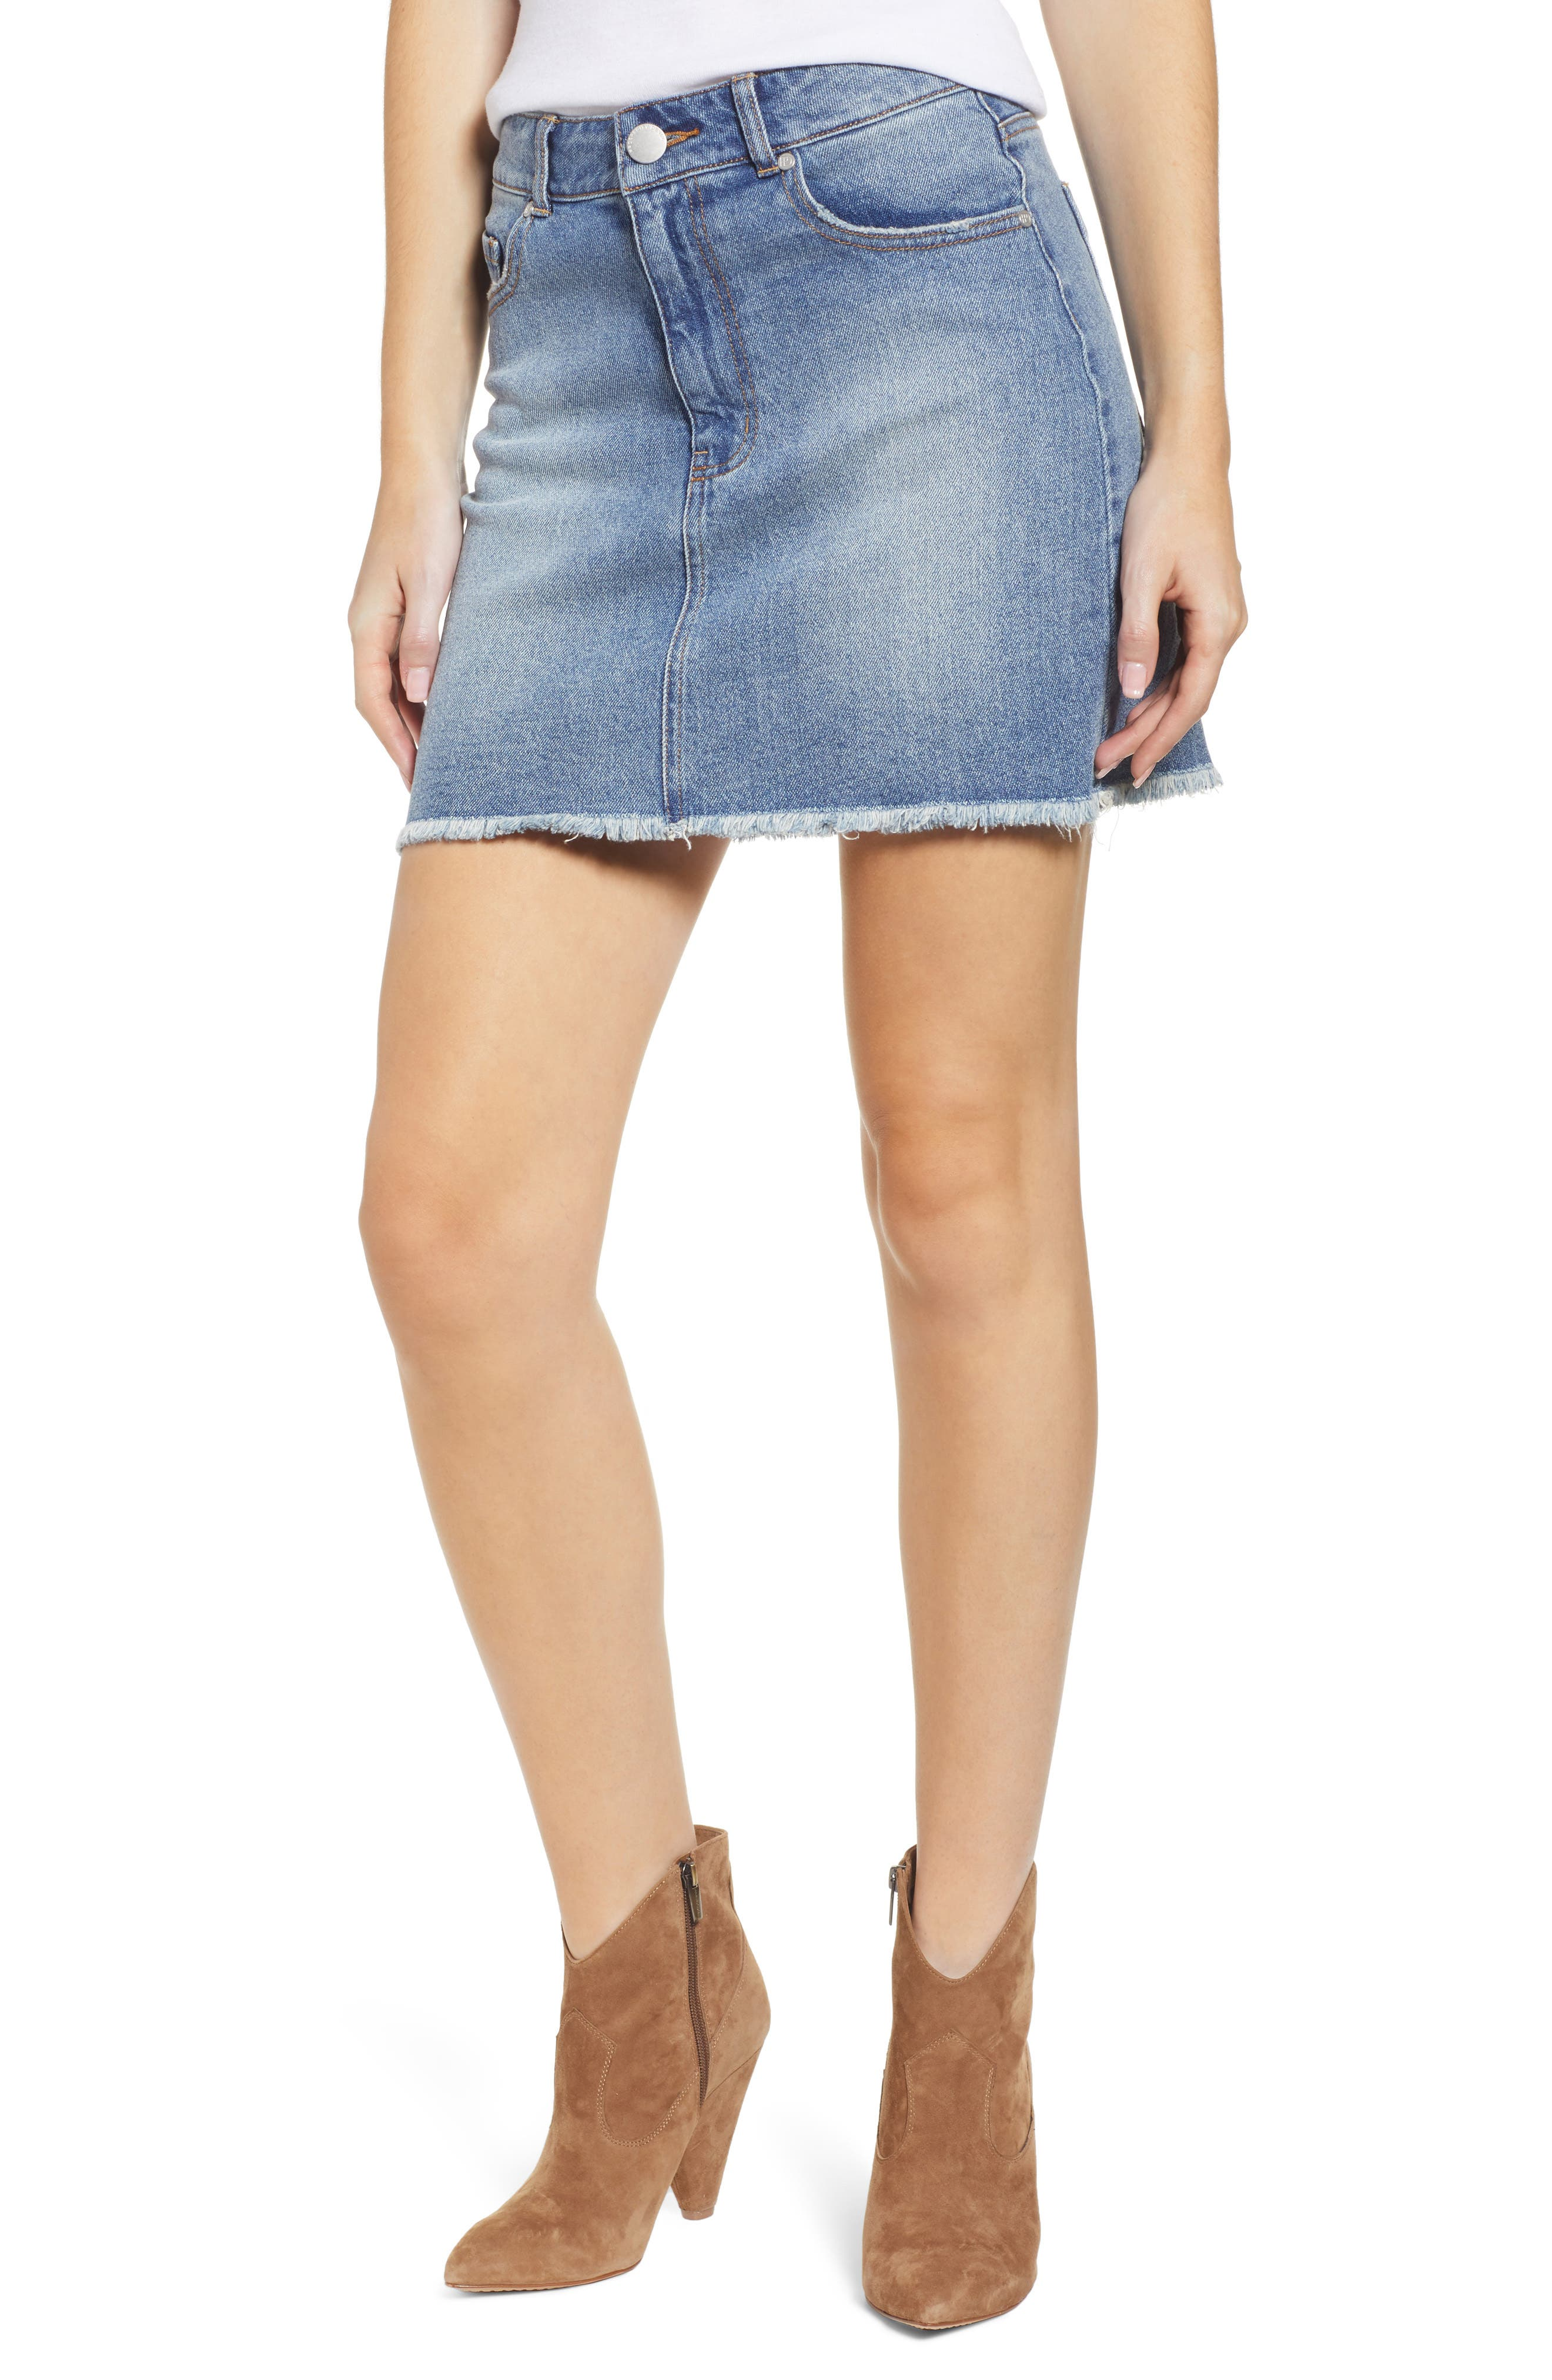 PROSPERITY DENIM, Raw Hem Denim Miniskirt, Main thumbnail 1, color, LIGHT WASH